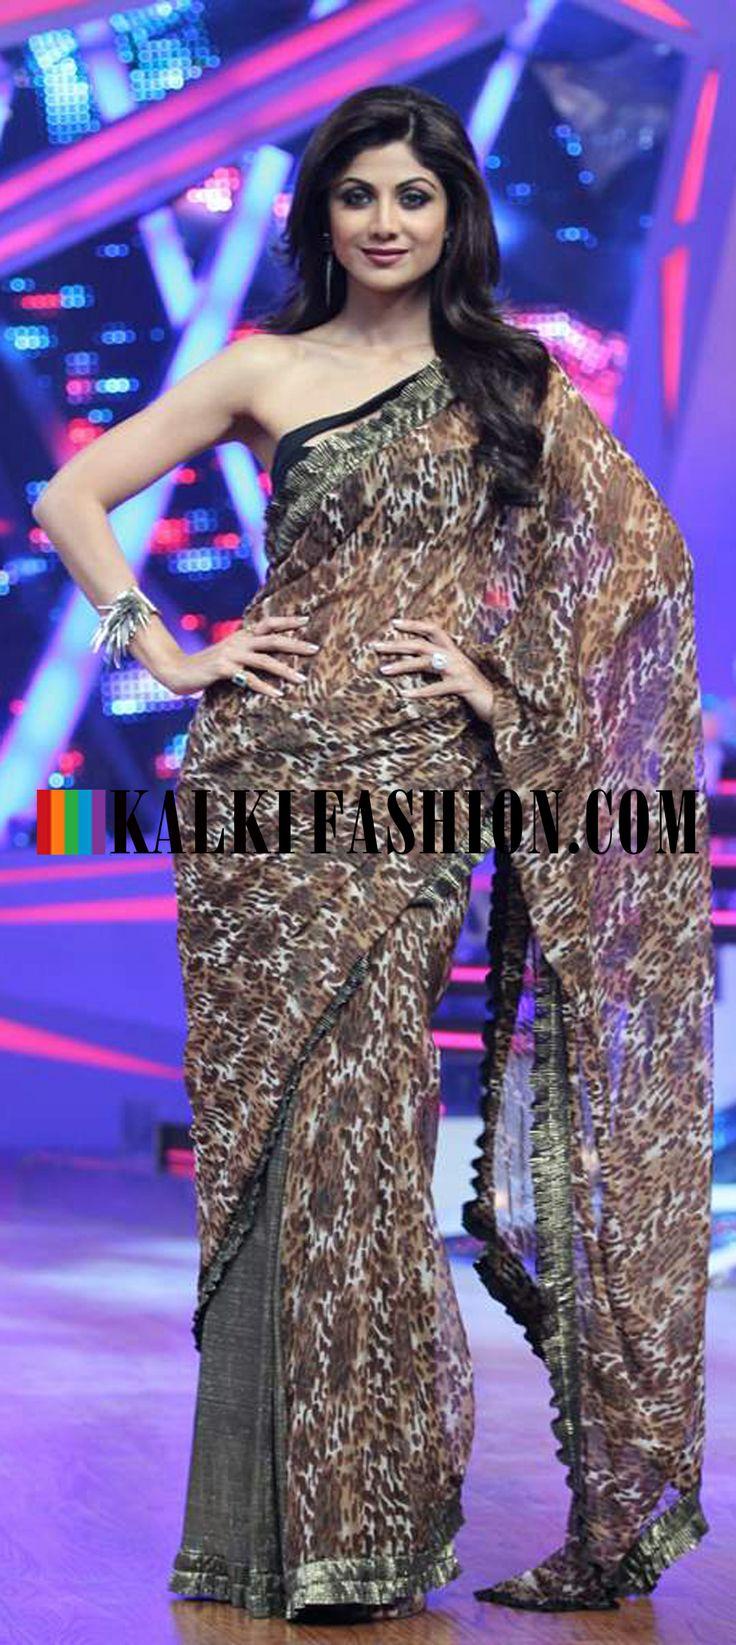 http://www.kalkifashion.com/ Shilpa Sheety in animal printed saree by Neeta Lulla on the set of Nach Baliye Season 6